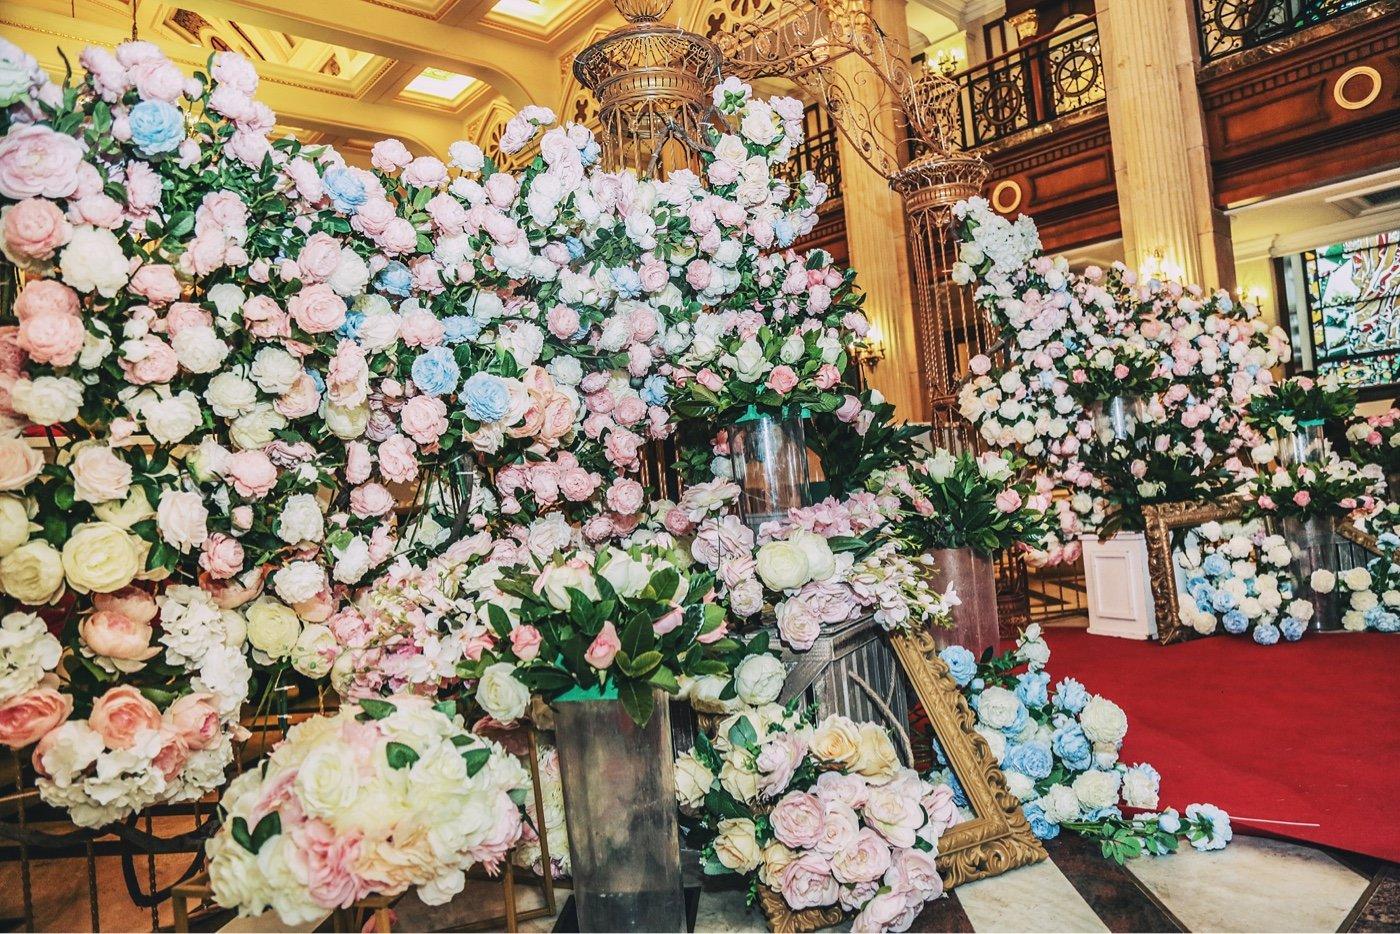 「Fantasy Wedding」&明珠教堂⛪16